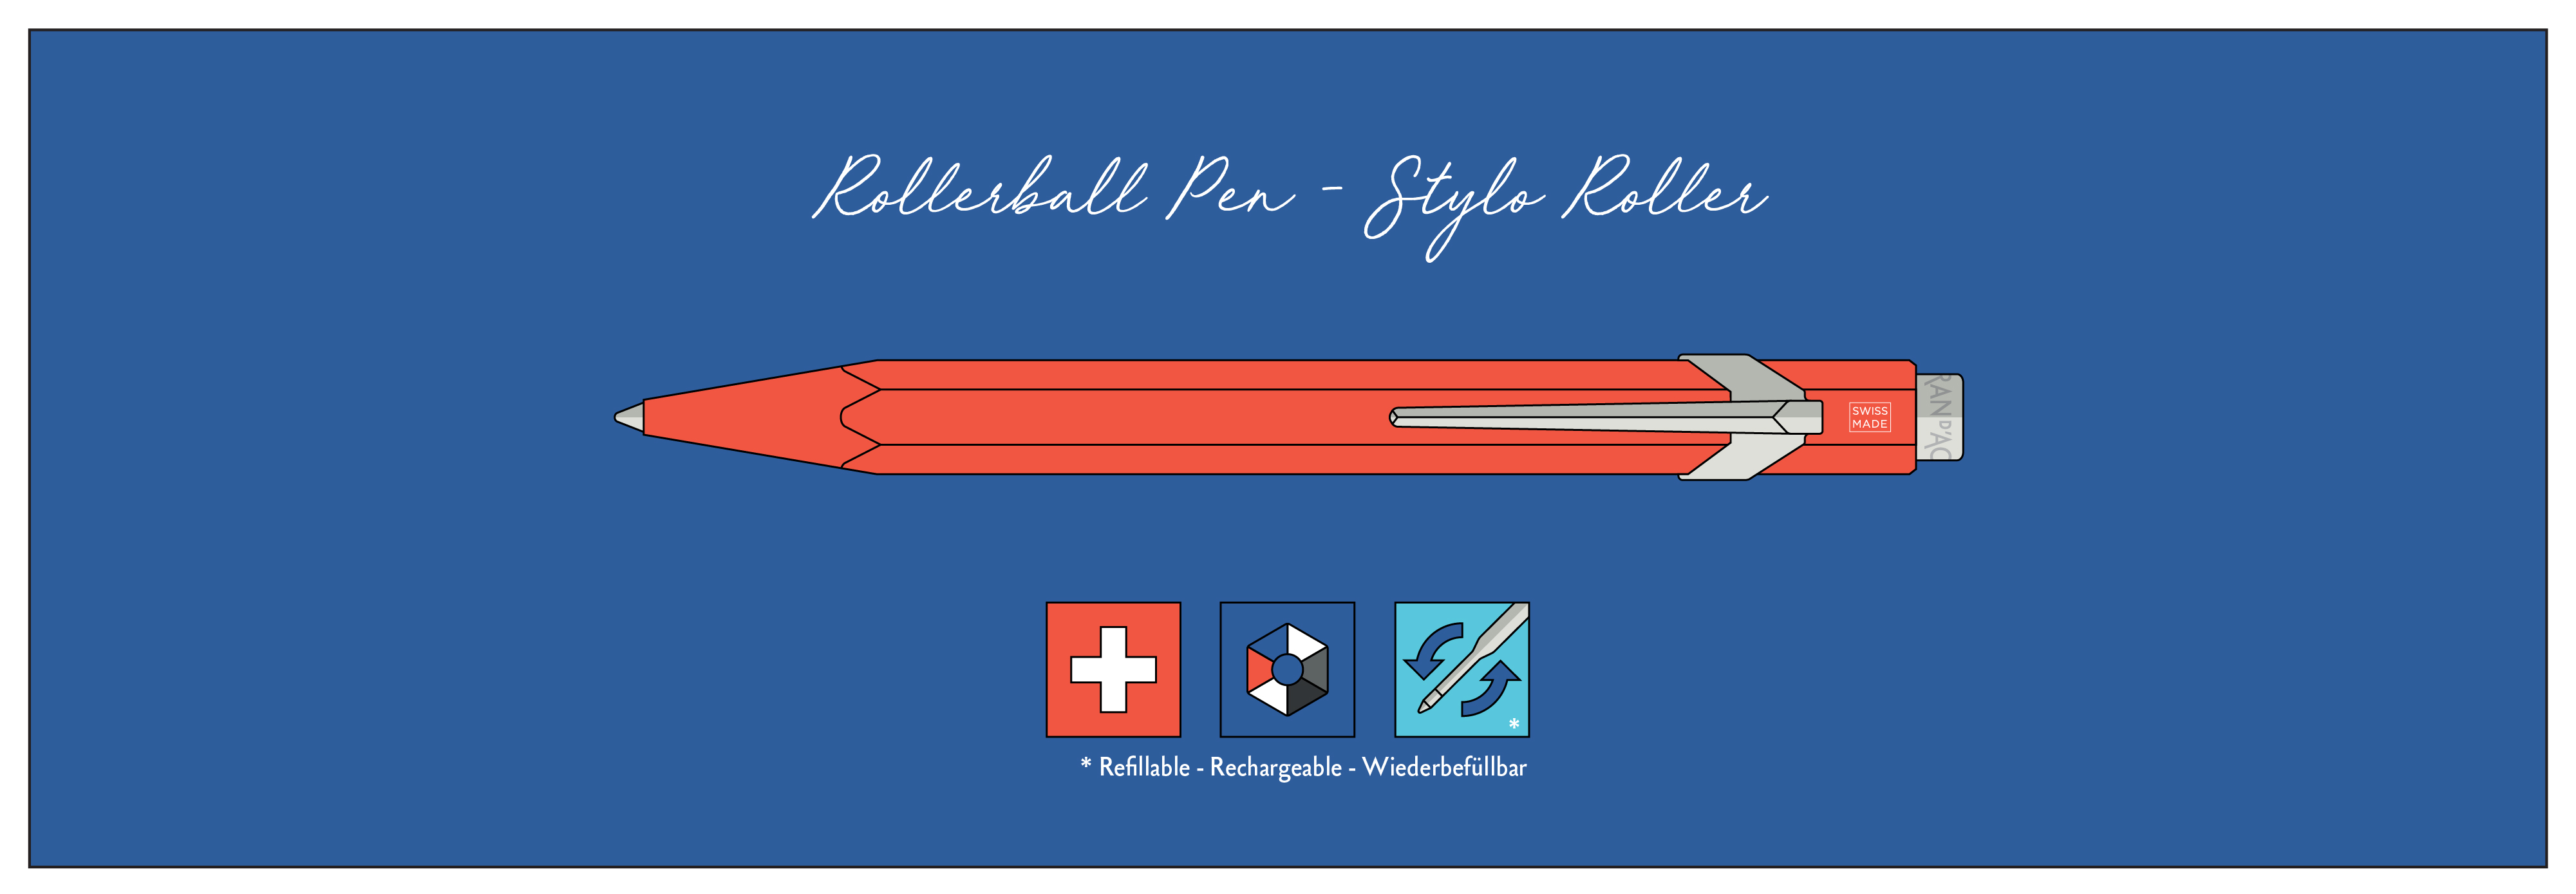 Ручки-ролери